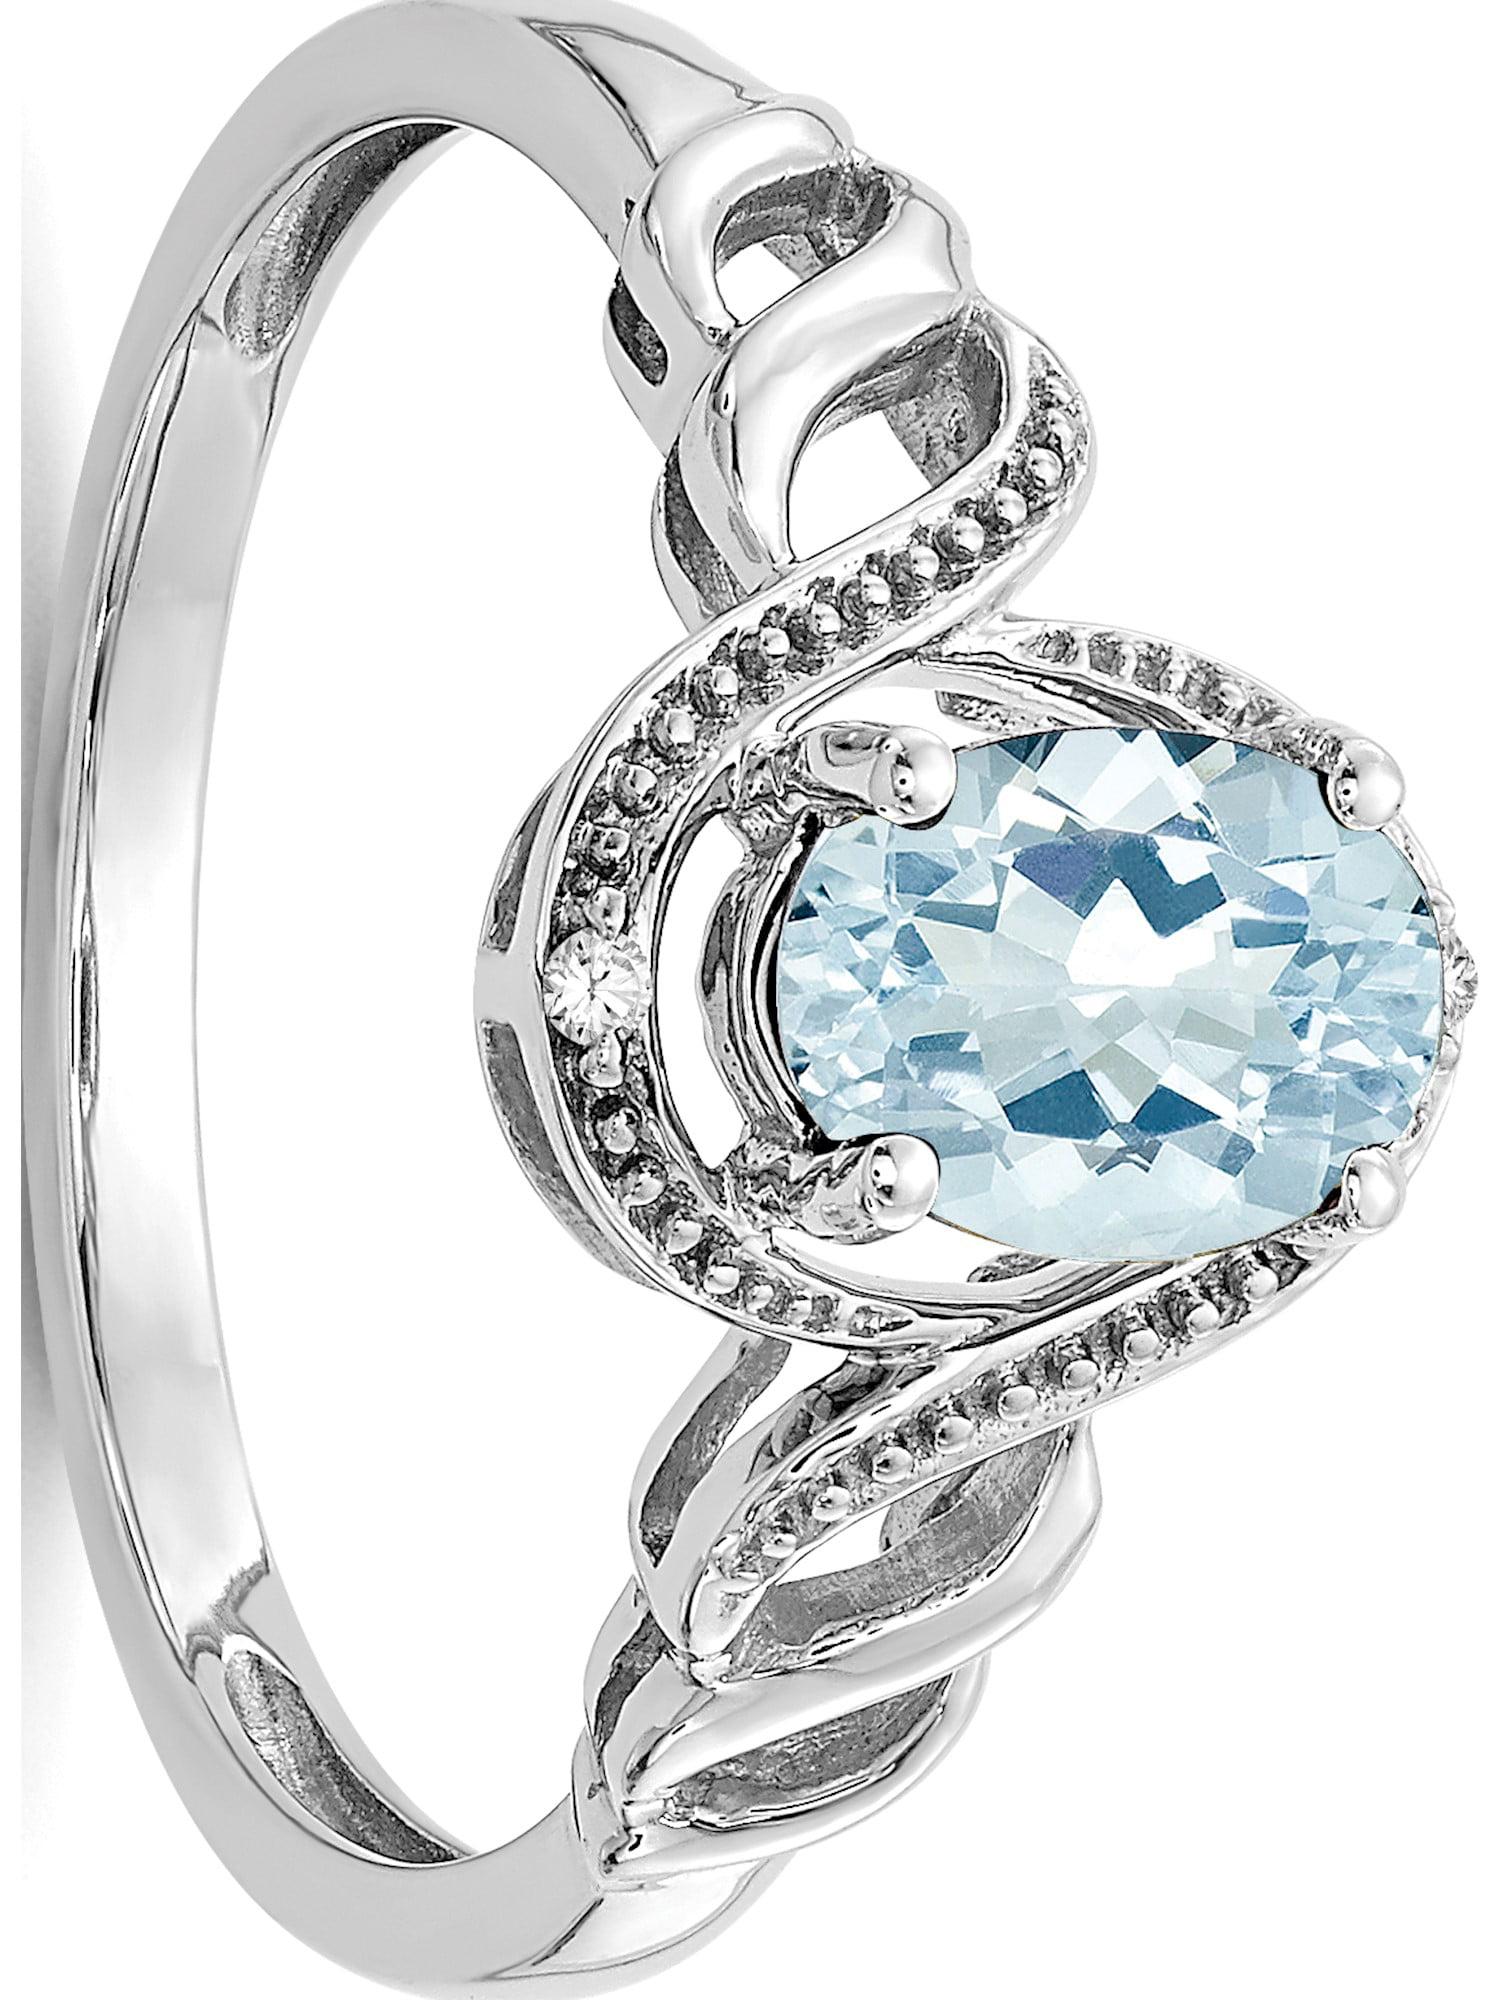 10k White Gold White Aquamarine Diamond Ring by